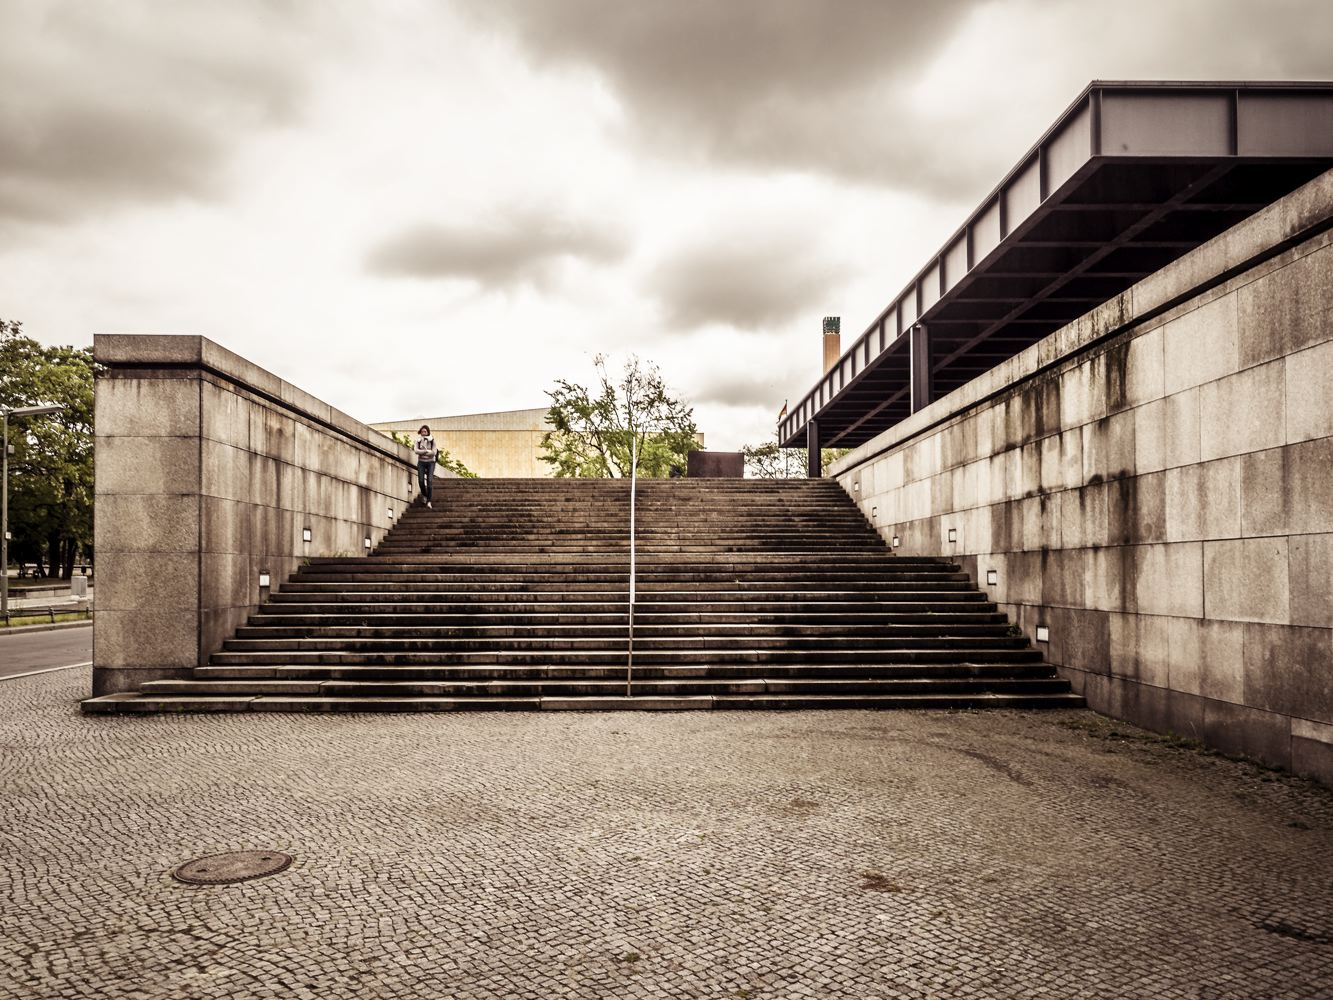 LDKphoto_BERLIN - Neue Nationalgalerie-015.jpg